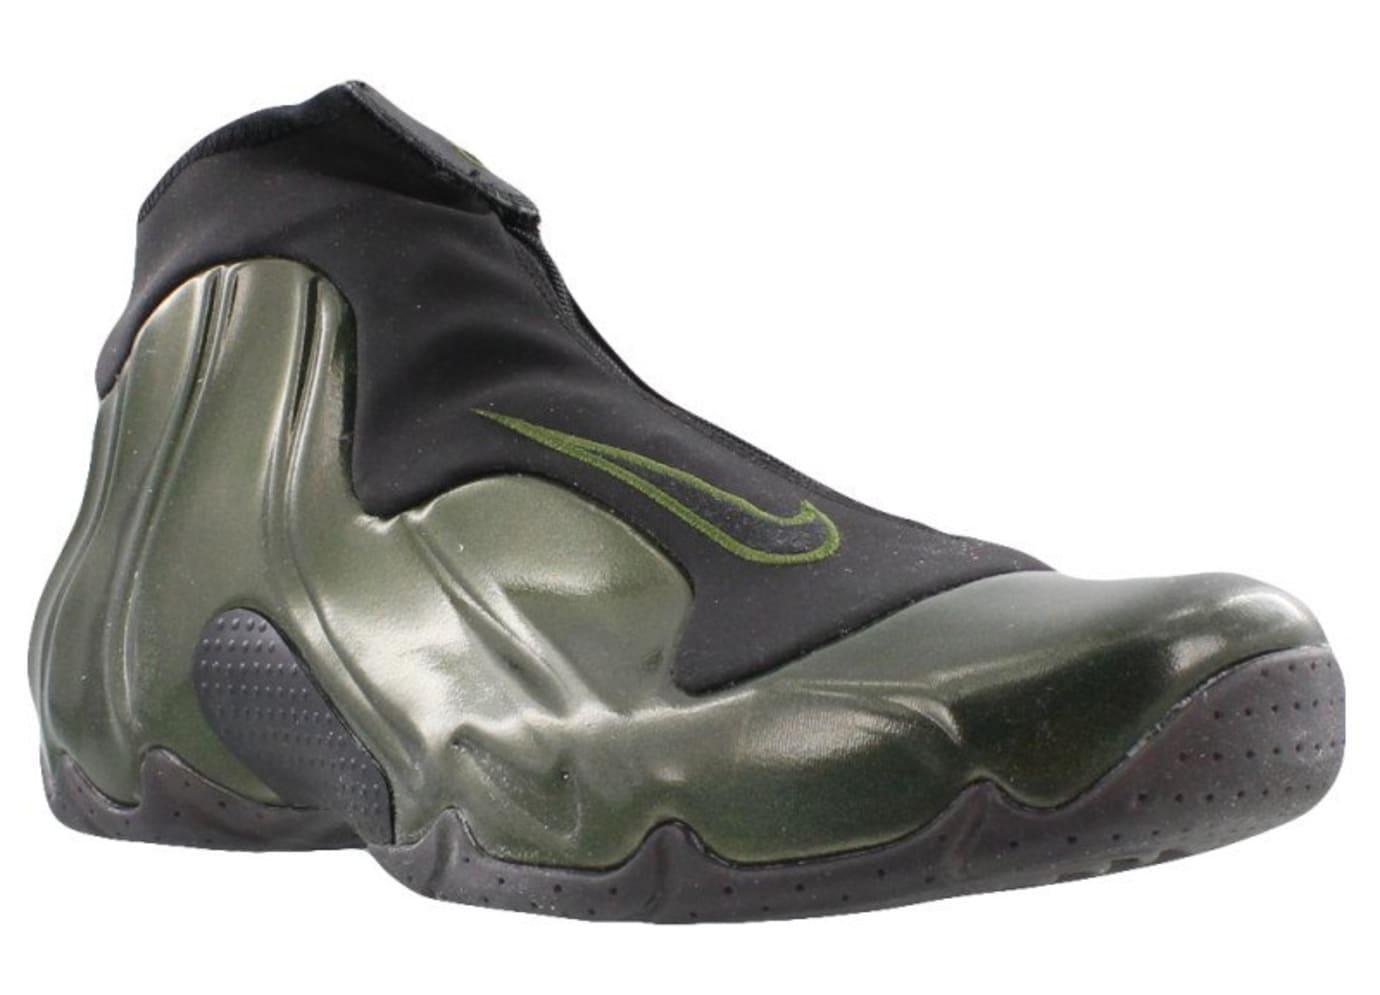 c20f384701 Image via City Gear Nike Flightposite  Legion Green  AO9378-300 1